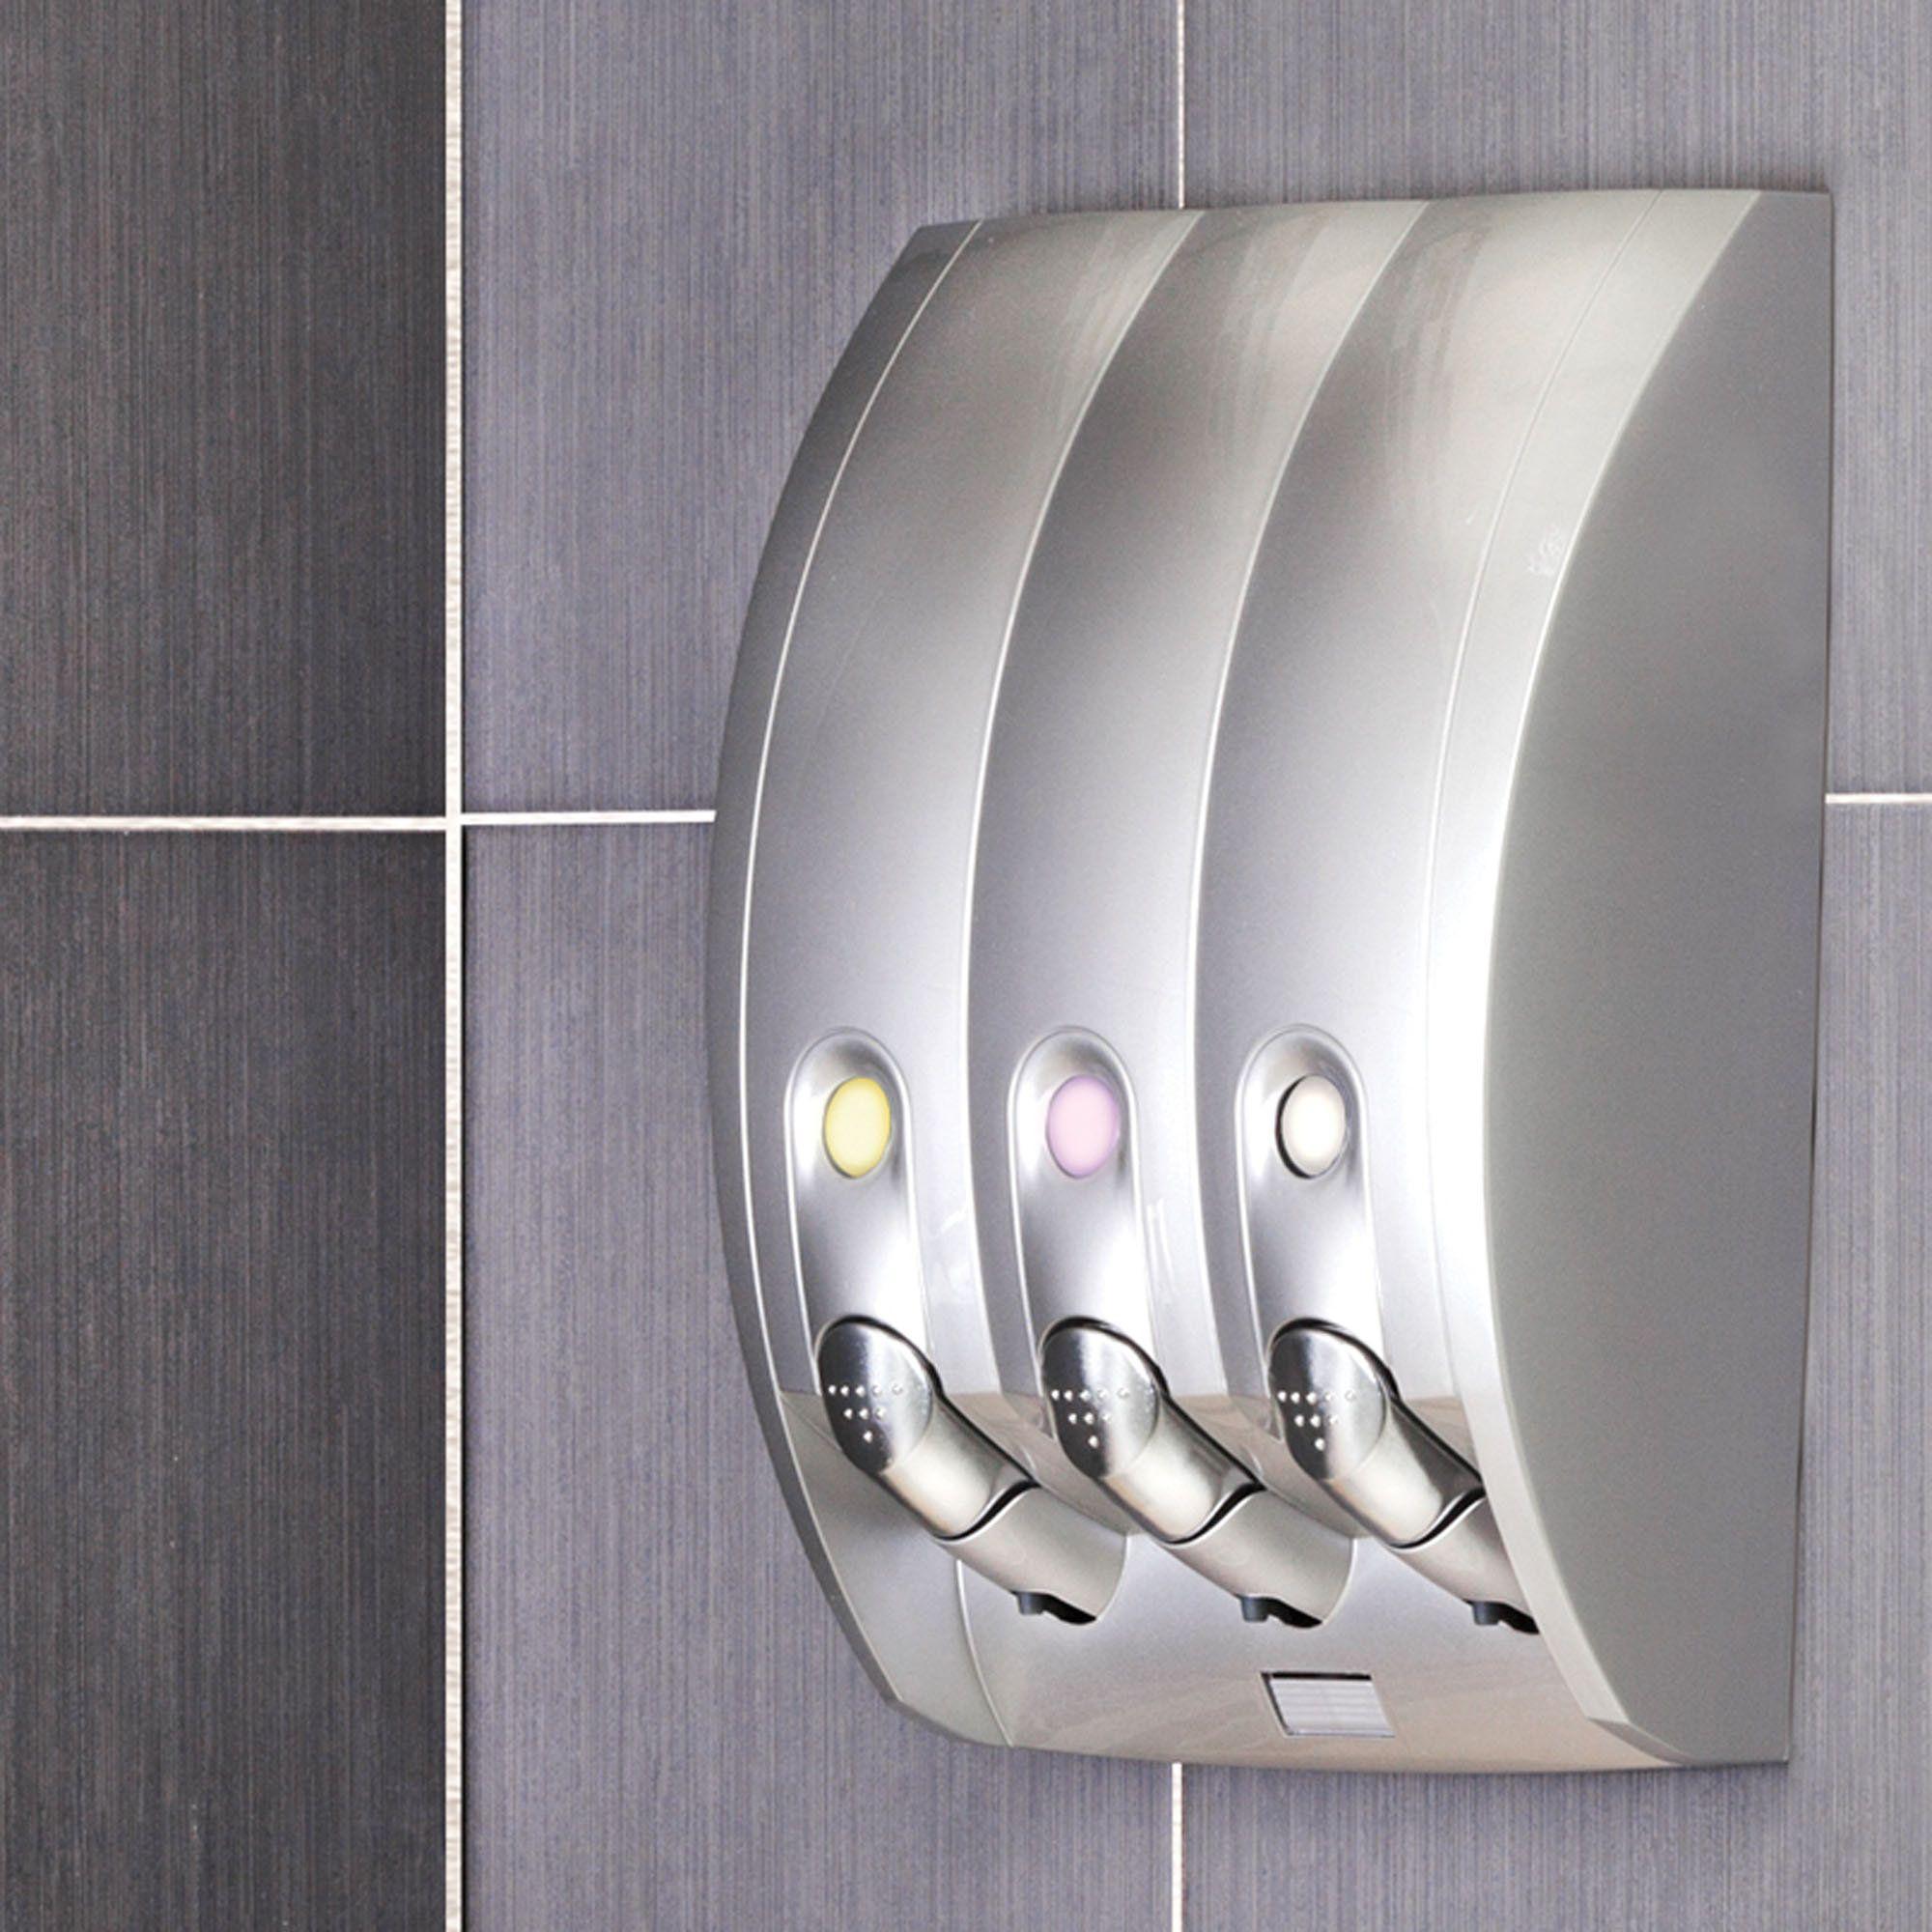 Curve Three Chamber Soap Shampoo Shower Dispenser Grinneel  # Muebles Bobrick